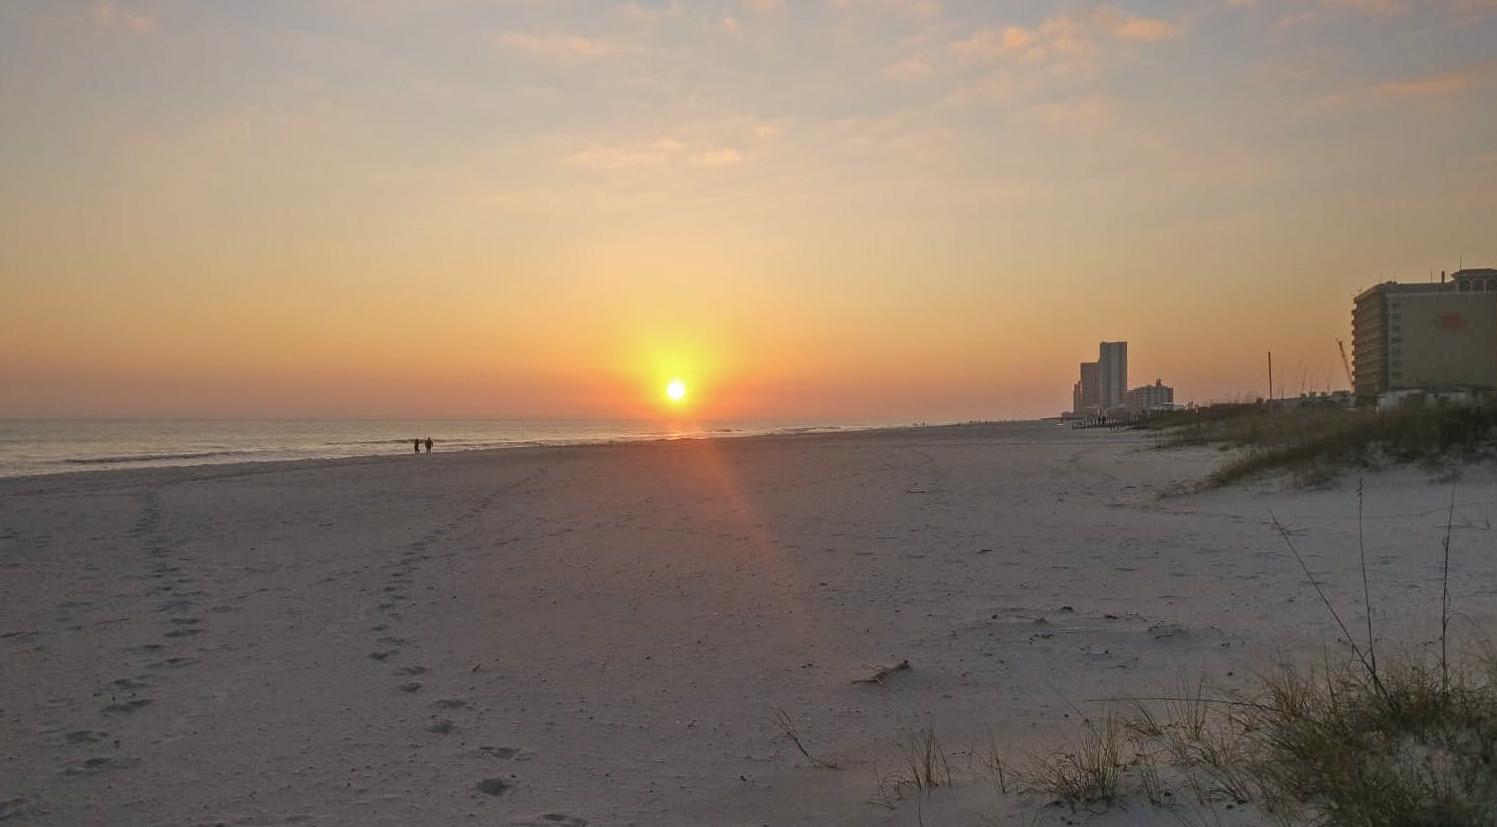 Sunset on the beach, Gulf Shores, Alabama